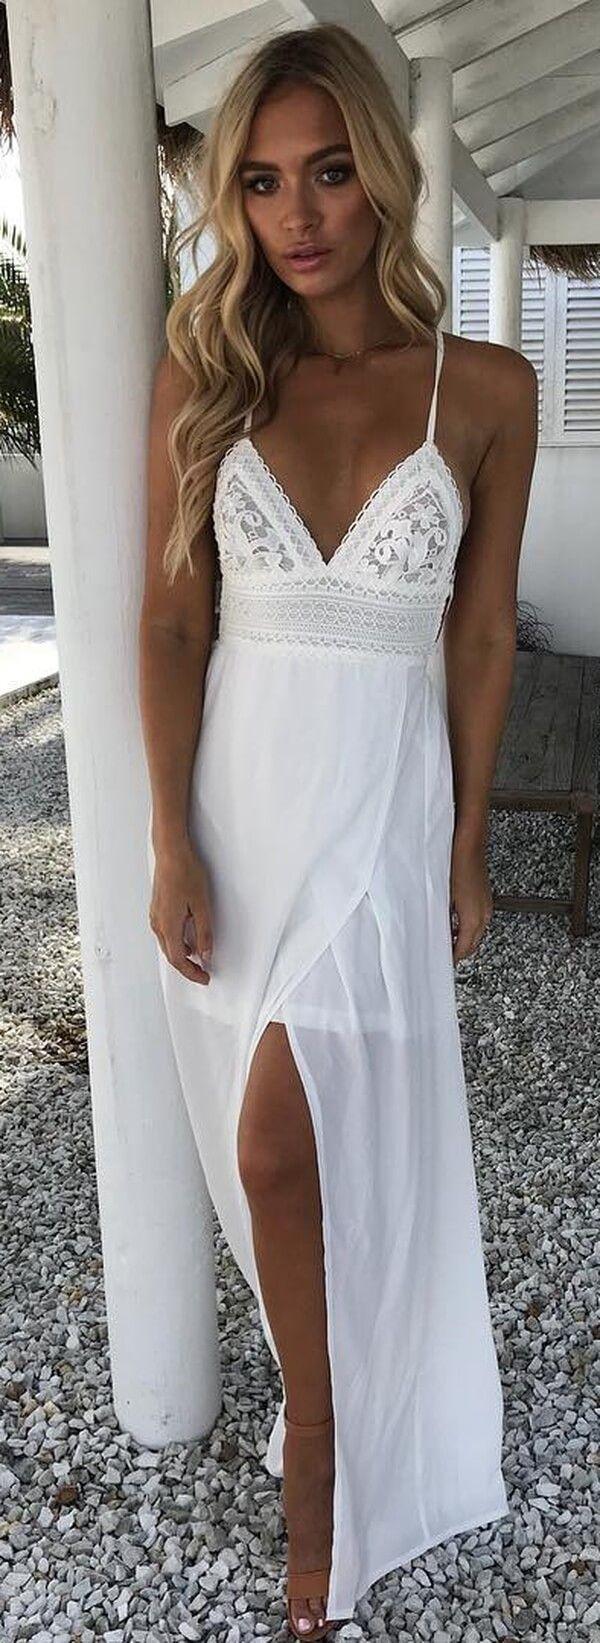 Bohemian White Cotton Maxi Summer Dress Women Fashion Bohemian Summer Dresses Boho Dresses Beach Fa Boho Dresses Long Women Long Dresses White Maxi Dresses [ 1643 x 600 Pixel ]